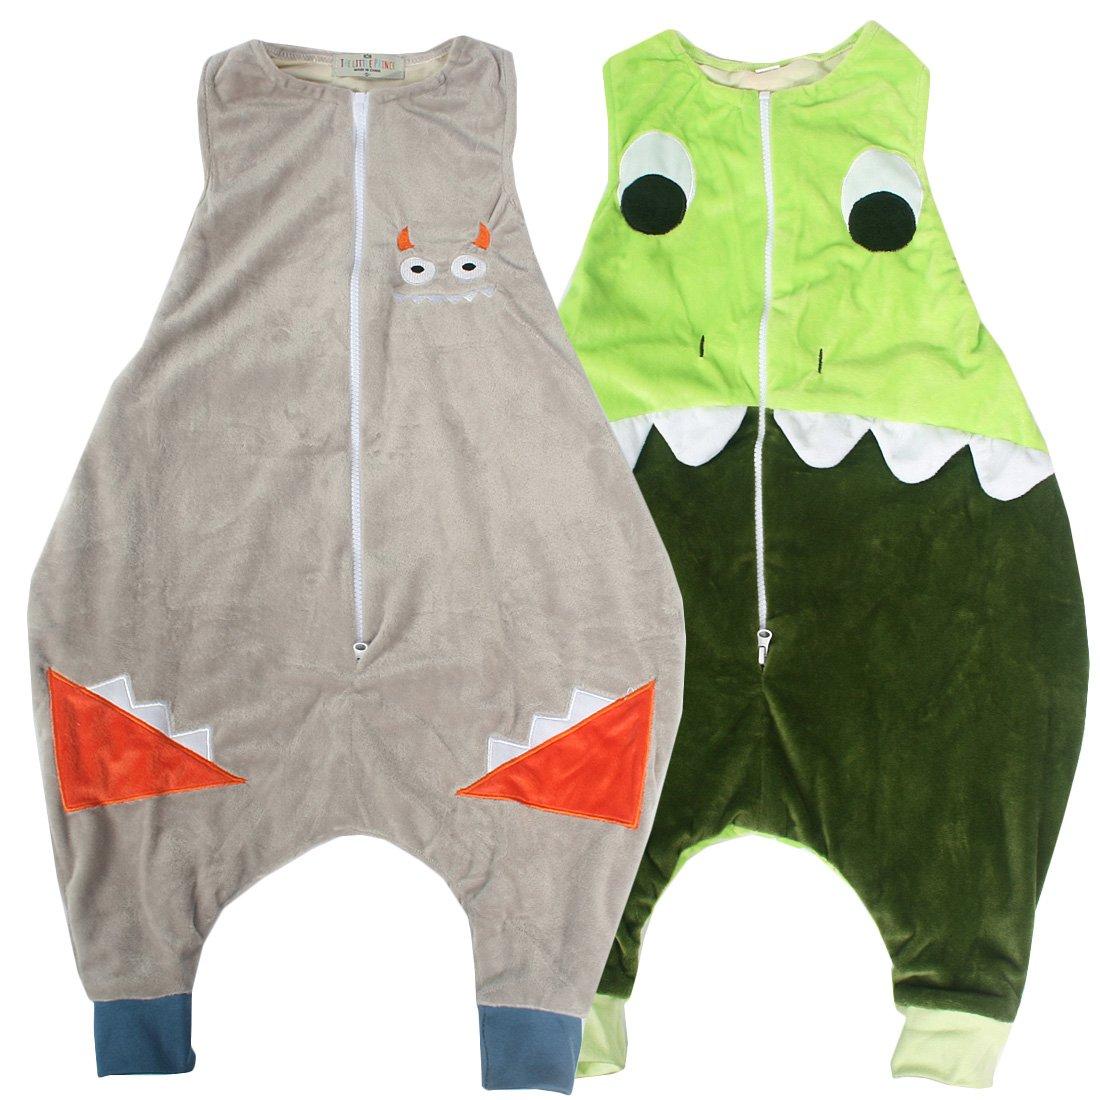 KF Baby Flannel Walker Sleep Bag Wearable Blanket for Kids, Set of 2 [M] kilofly